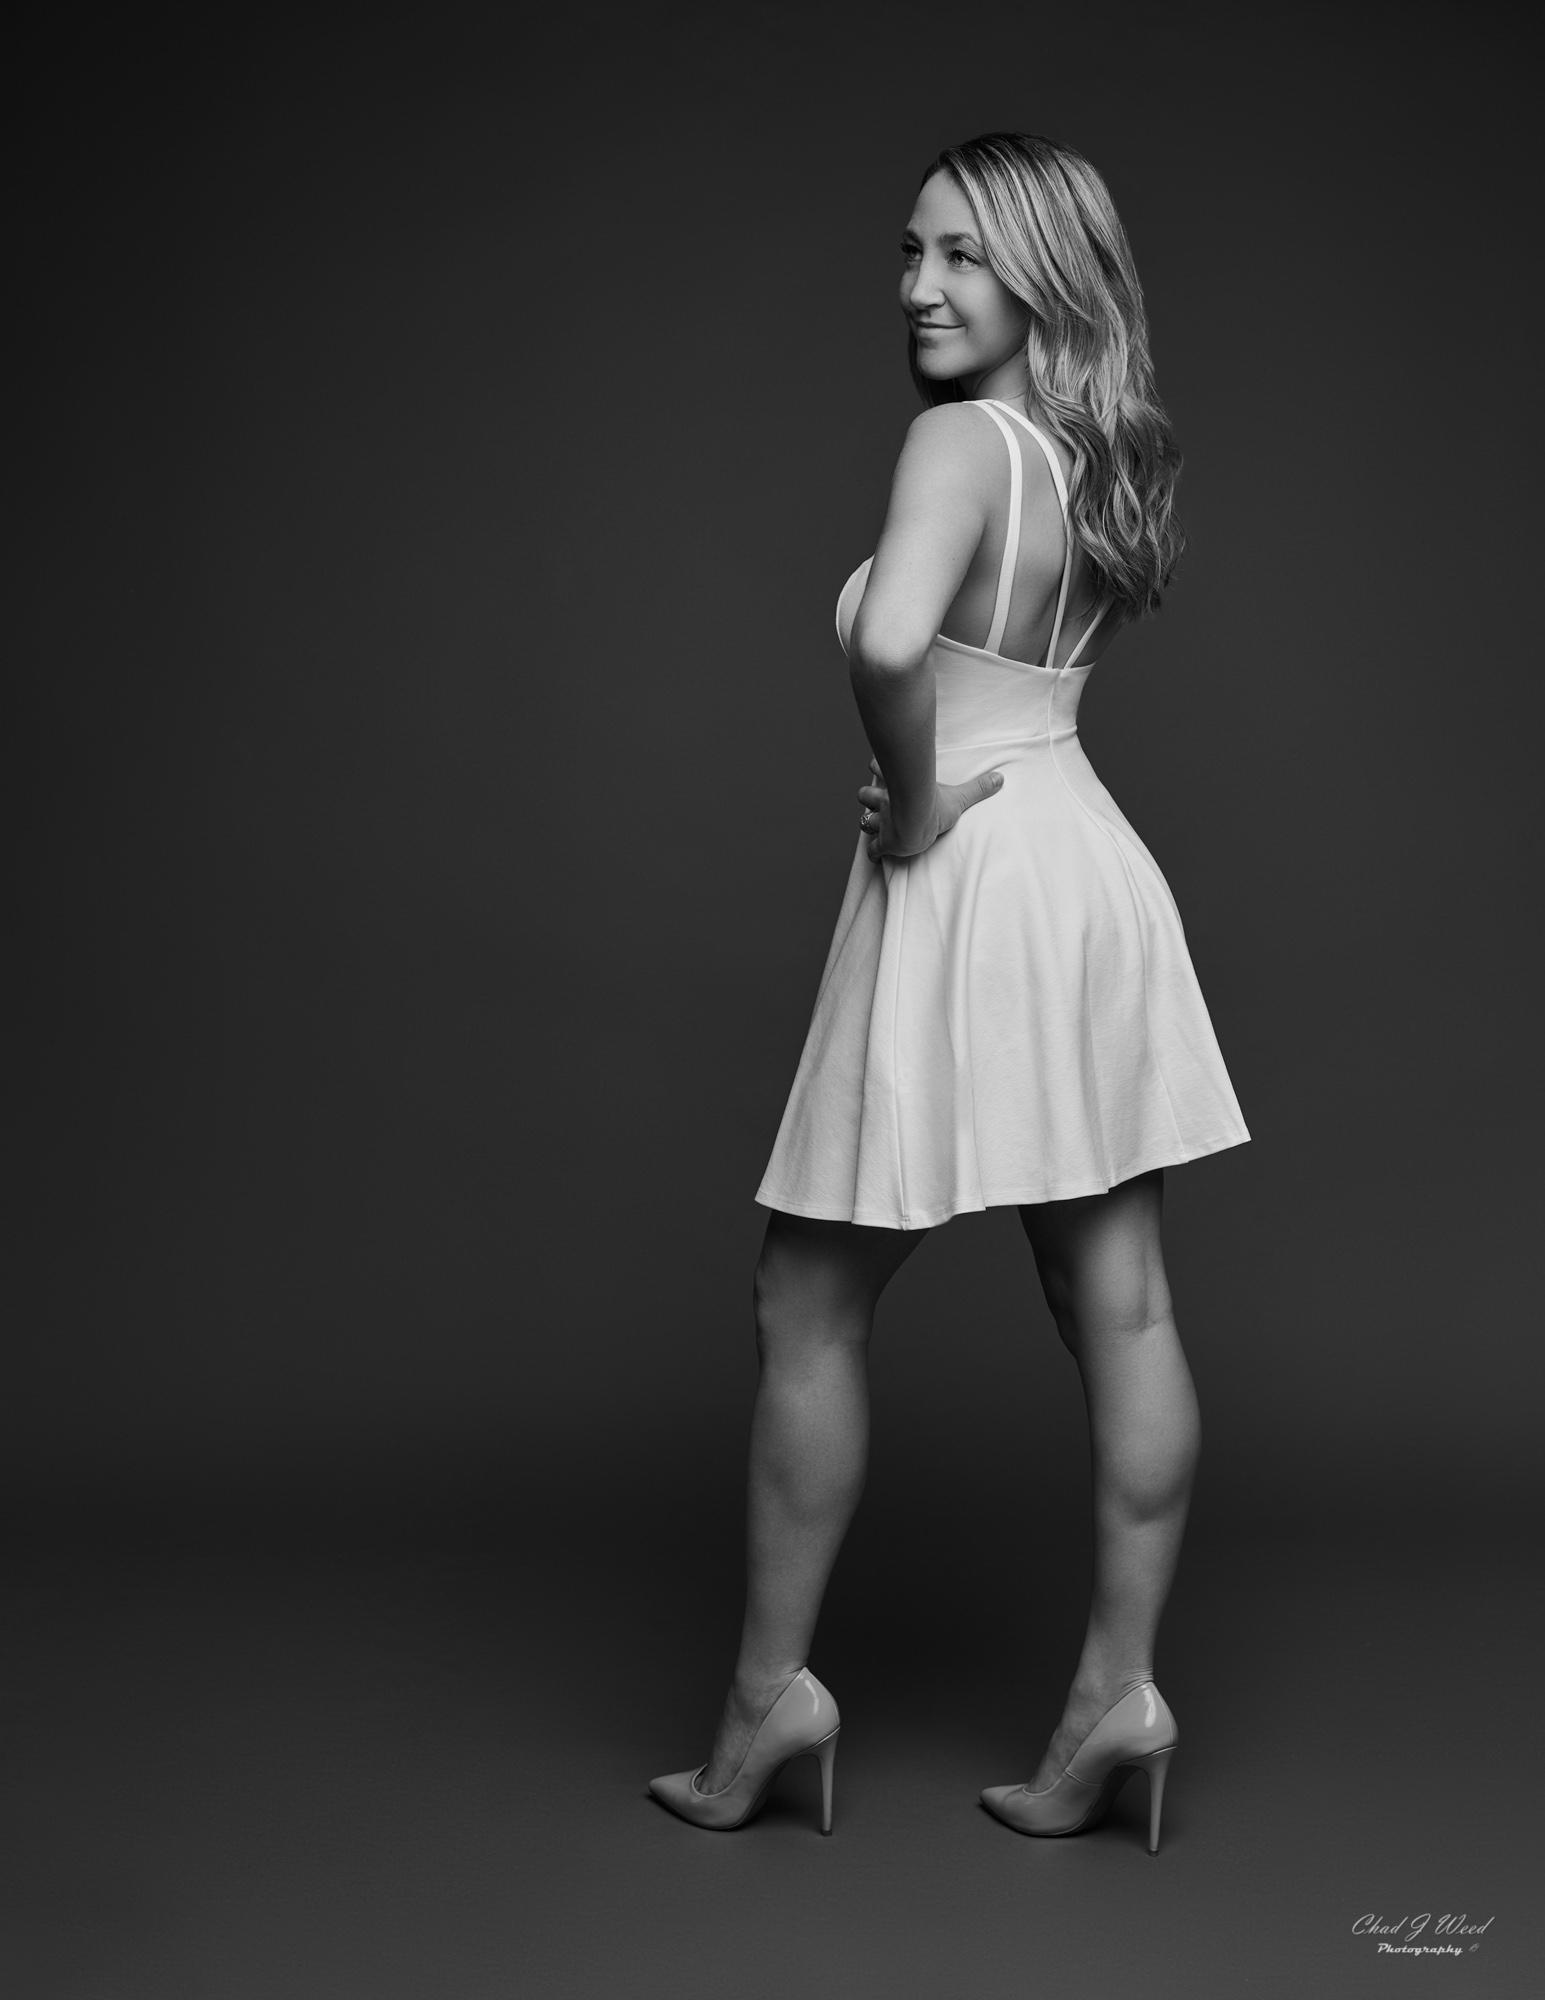 Kristen Figure Model by Mesa Arizona Portrait Photographer Chad Weed